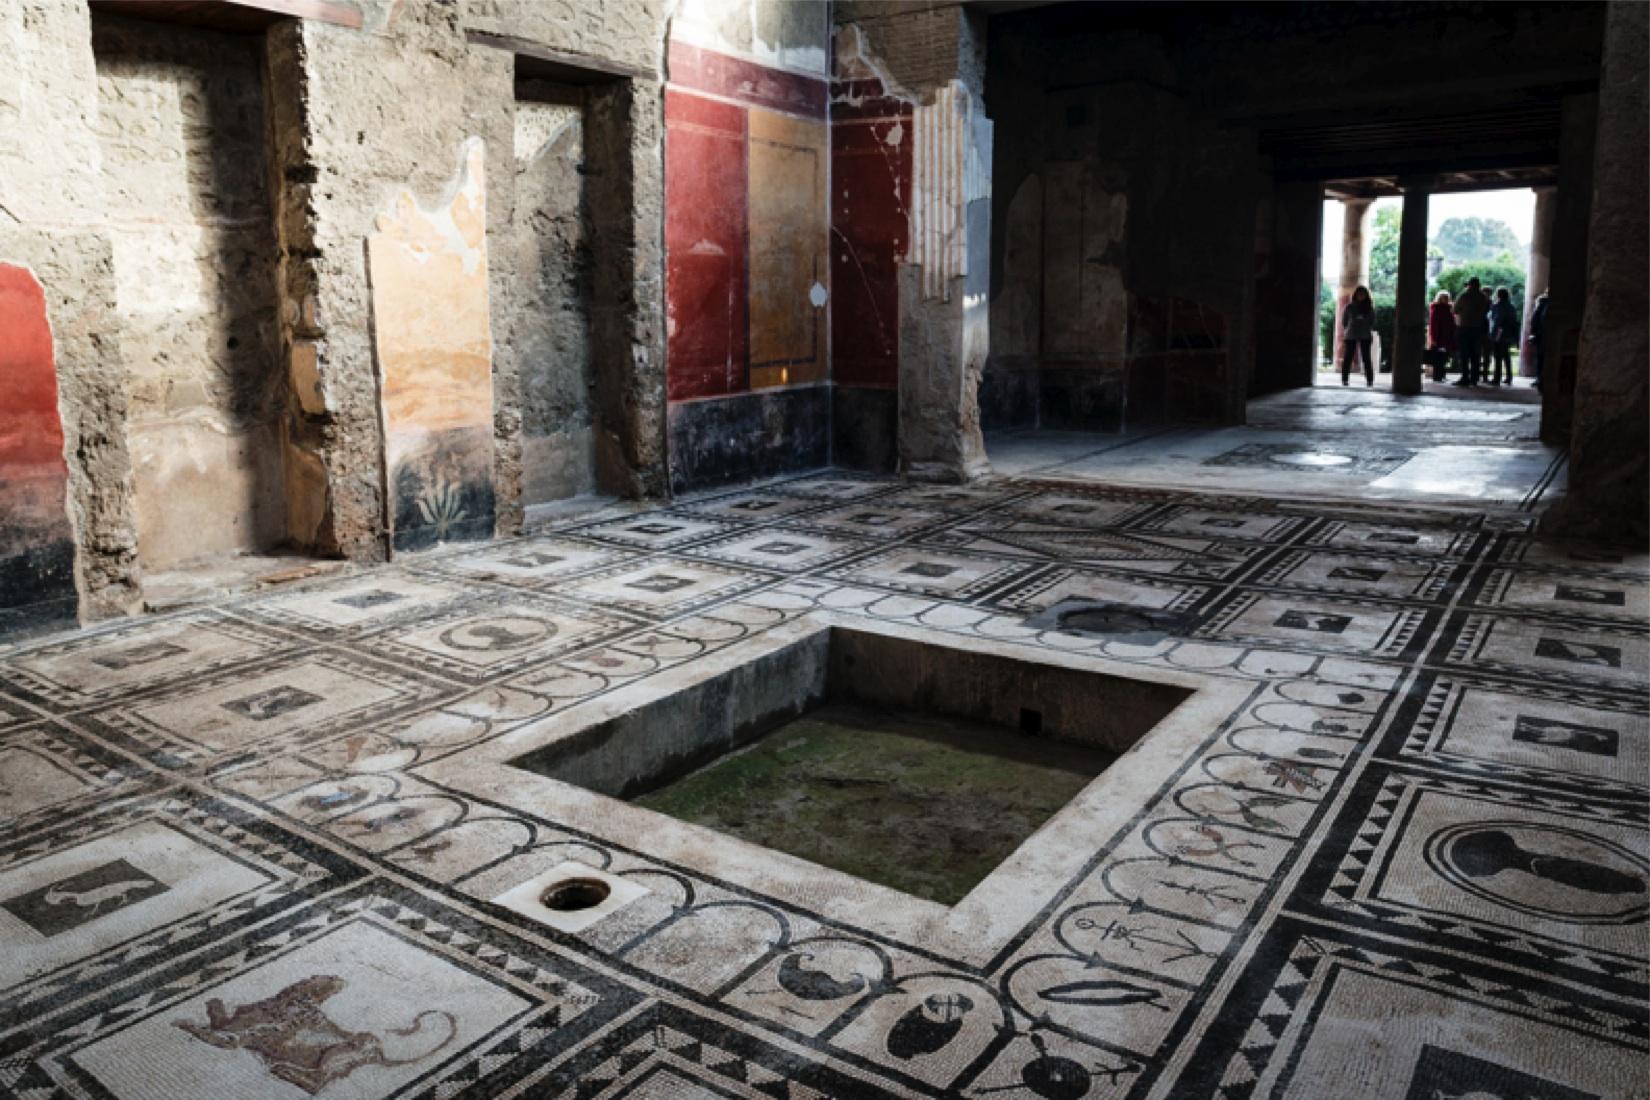 Pavimento mosaico cronache salerno for Mosaico pavimento